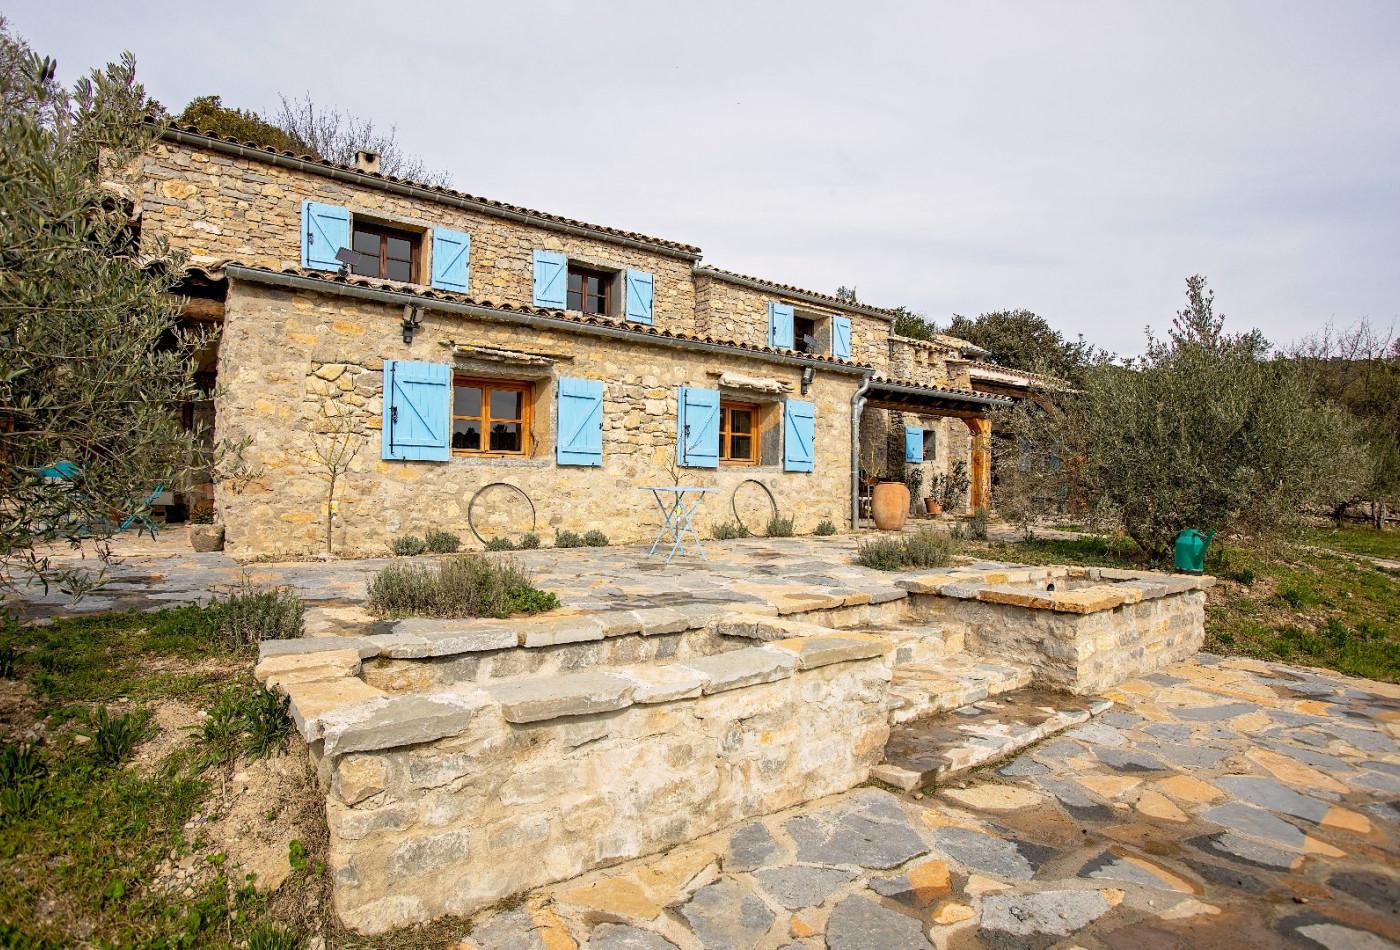 A vendre  Montpellier | Réf 340138493 - Agence galerie casanova